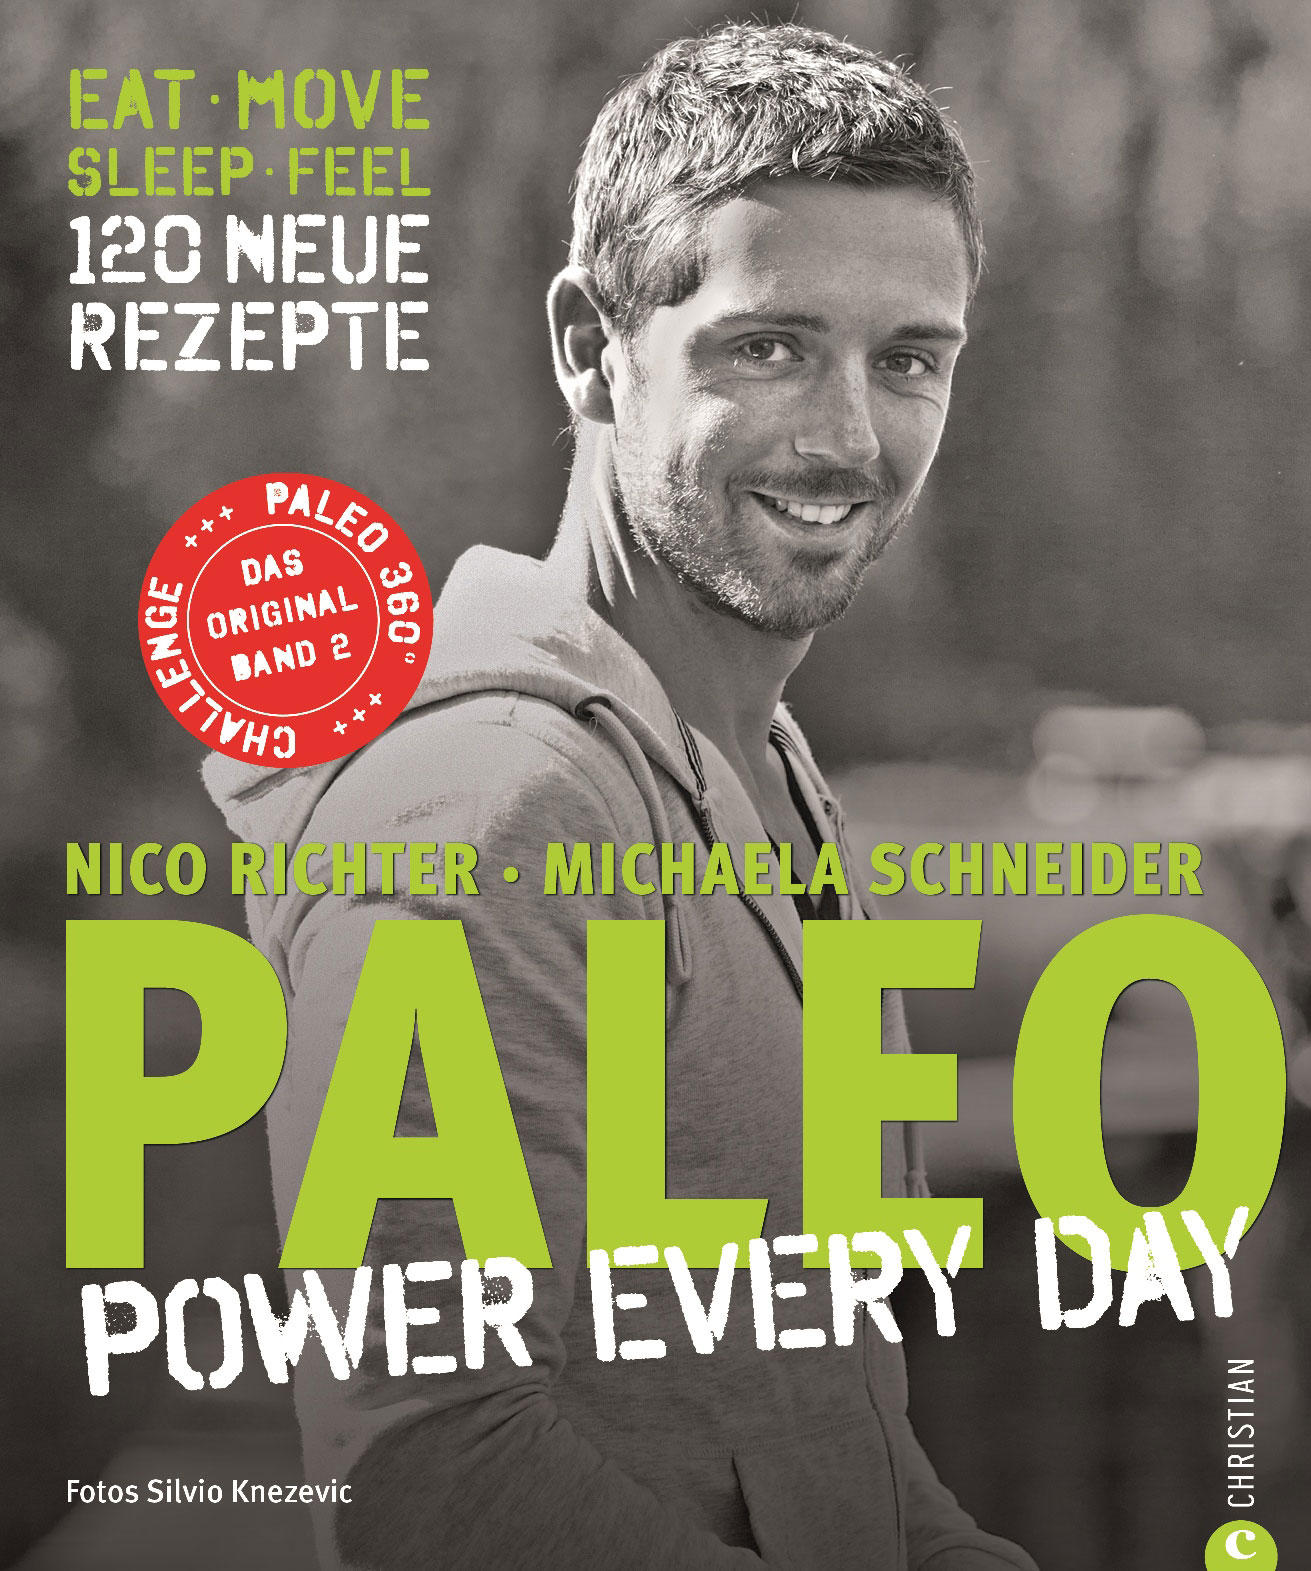 Paleo Power Every Day